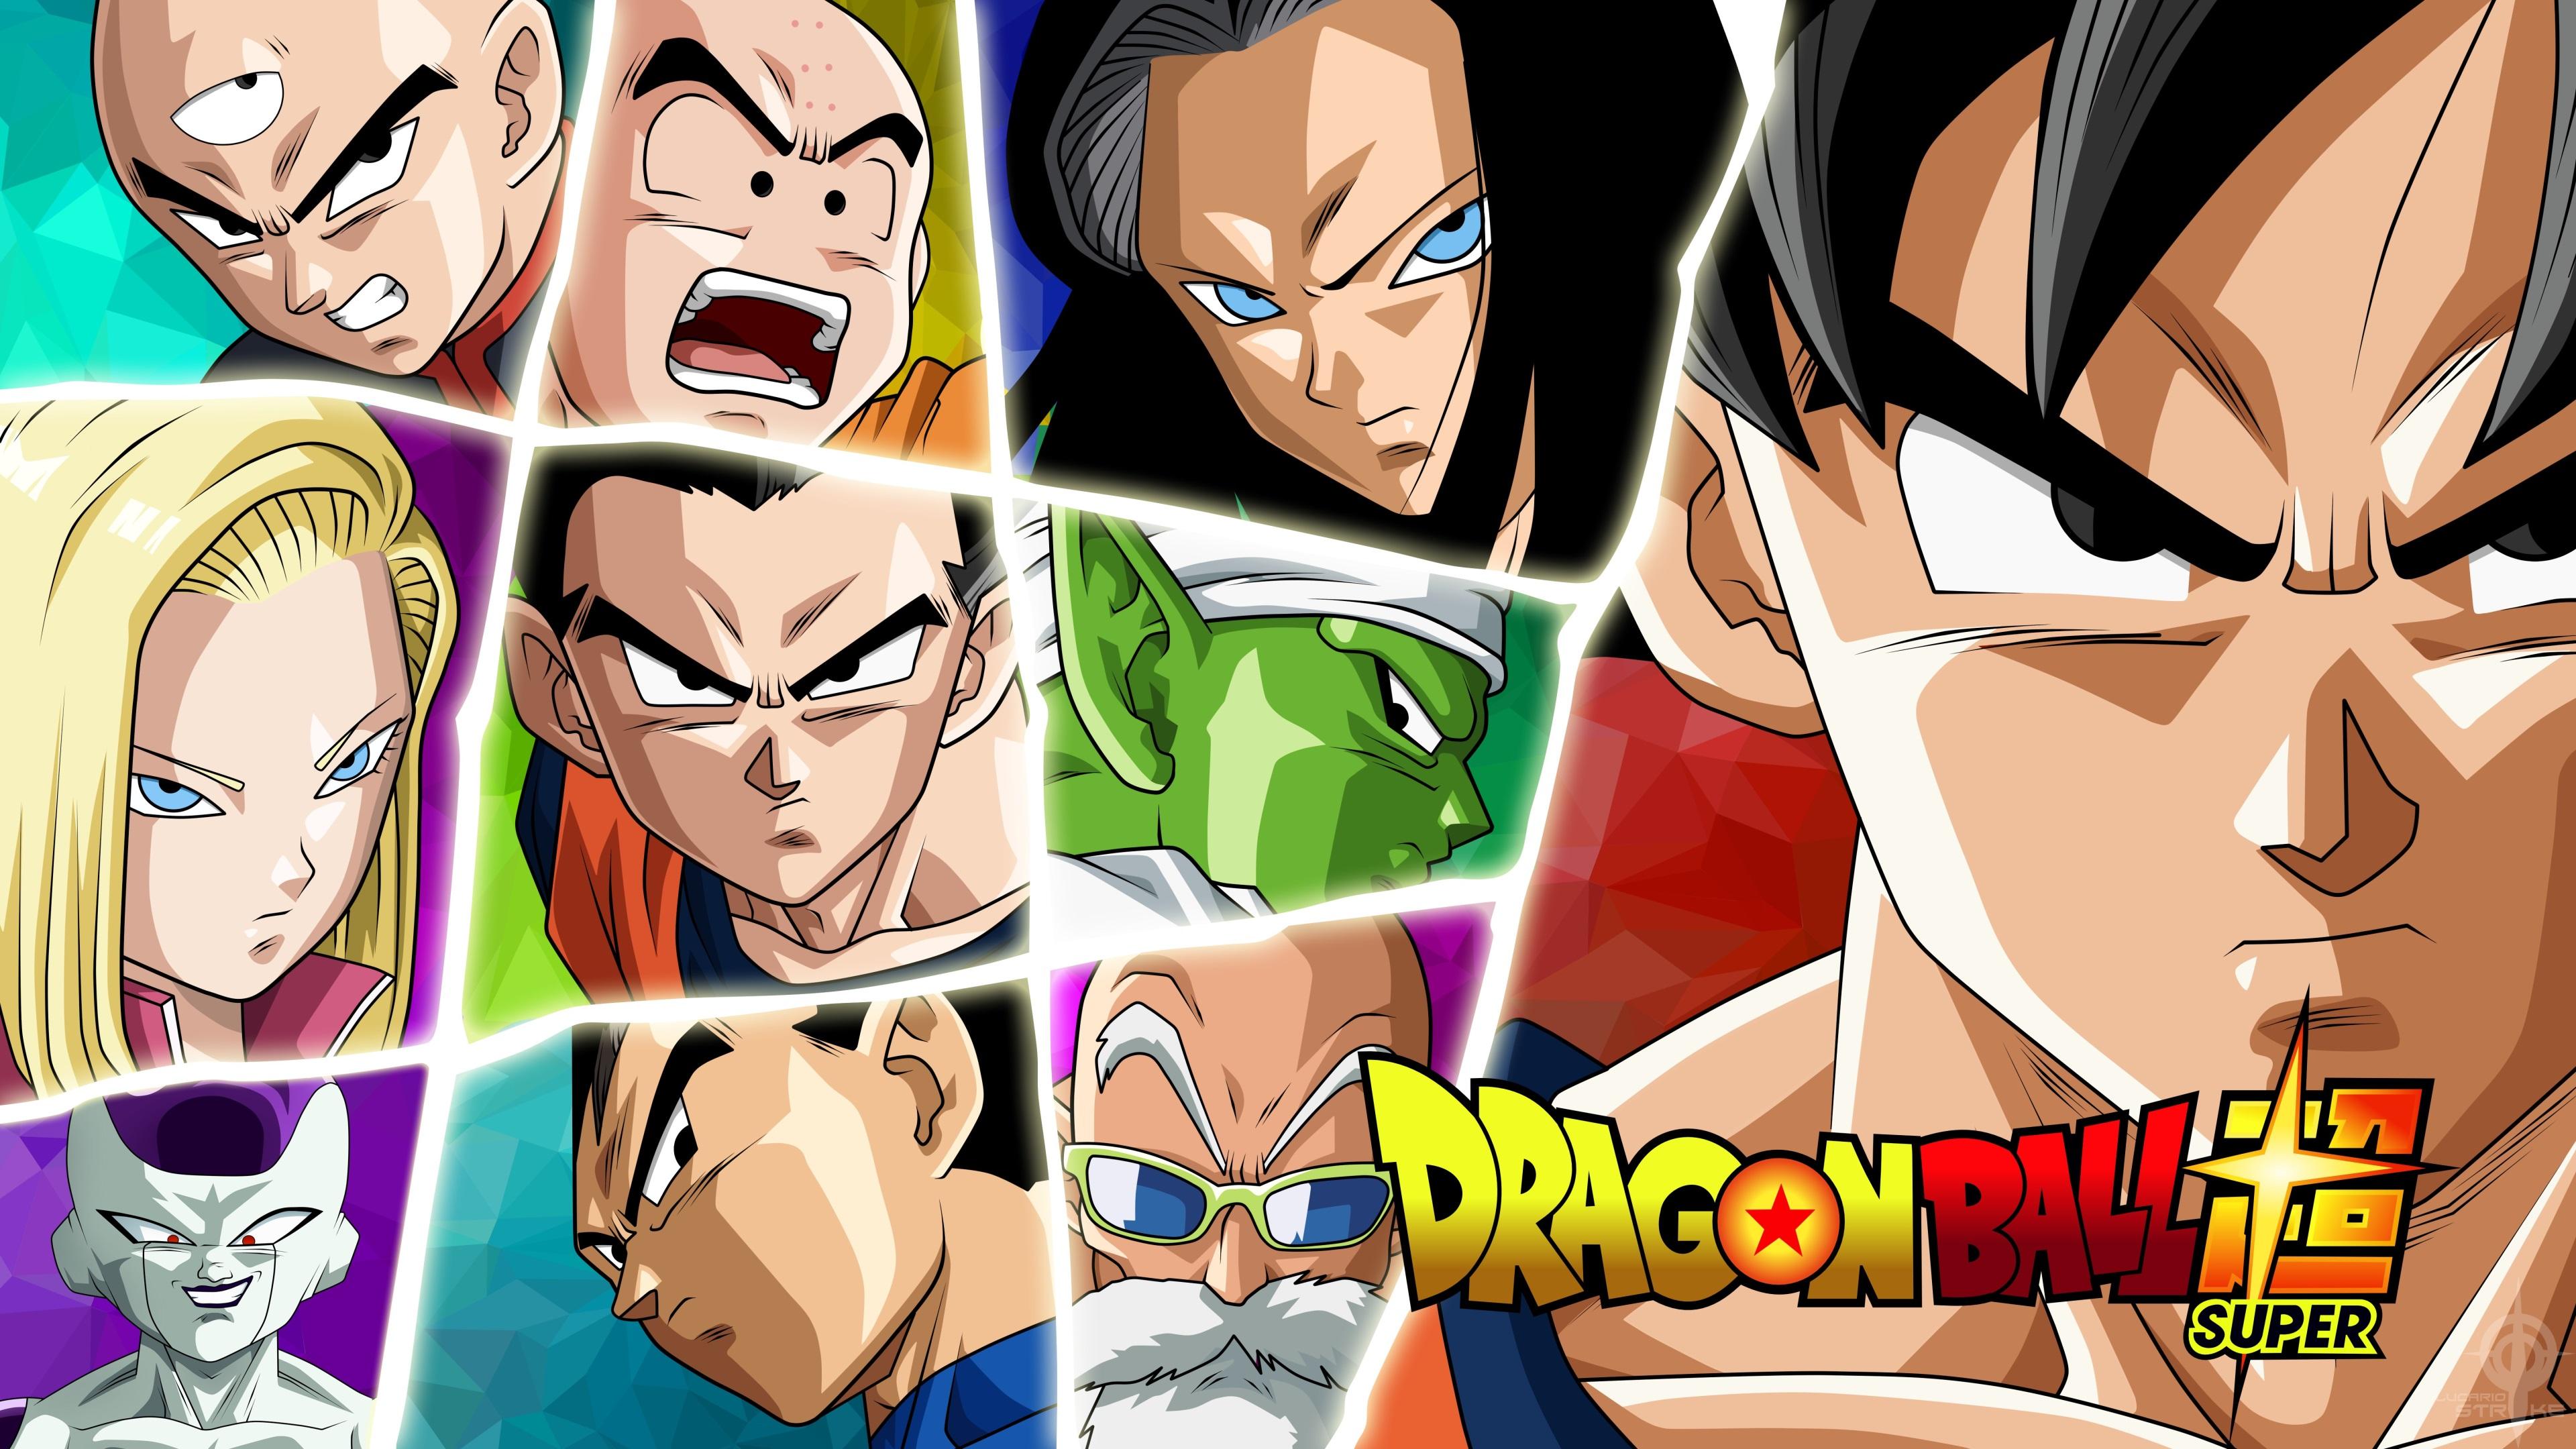 Wallpaper : Dragon Ball Super 3840x2160